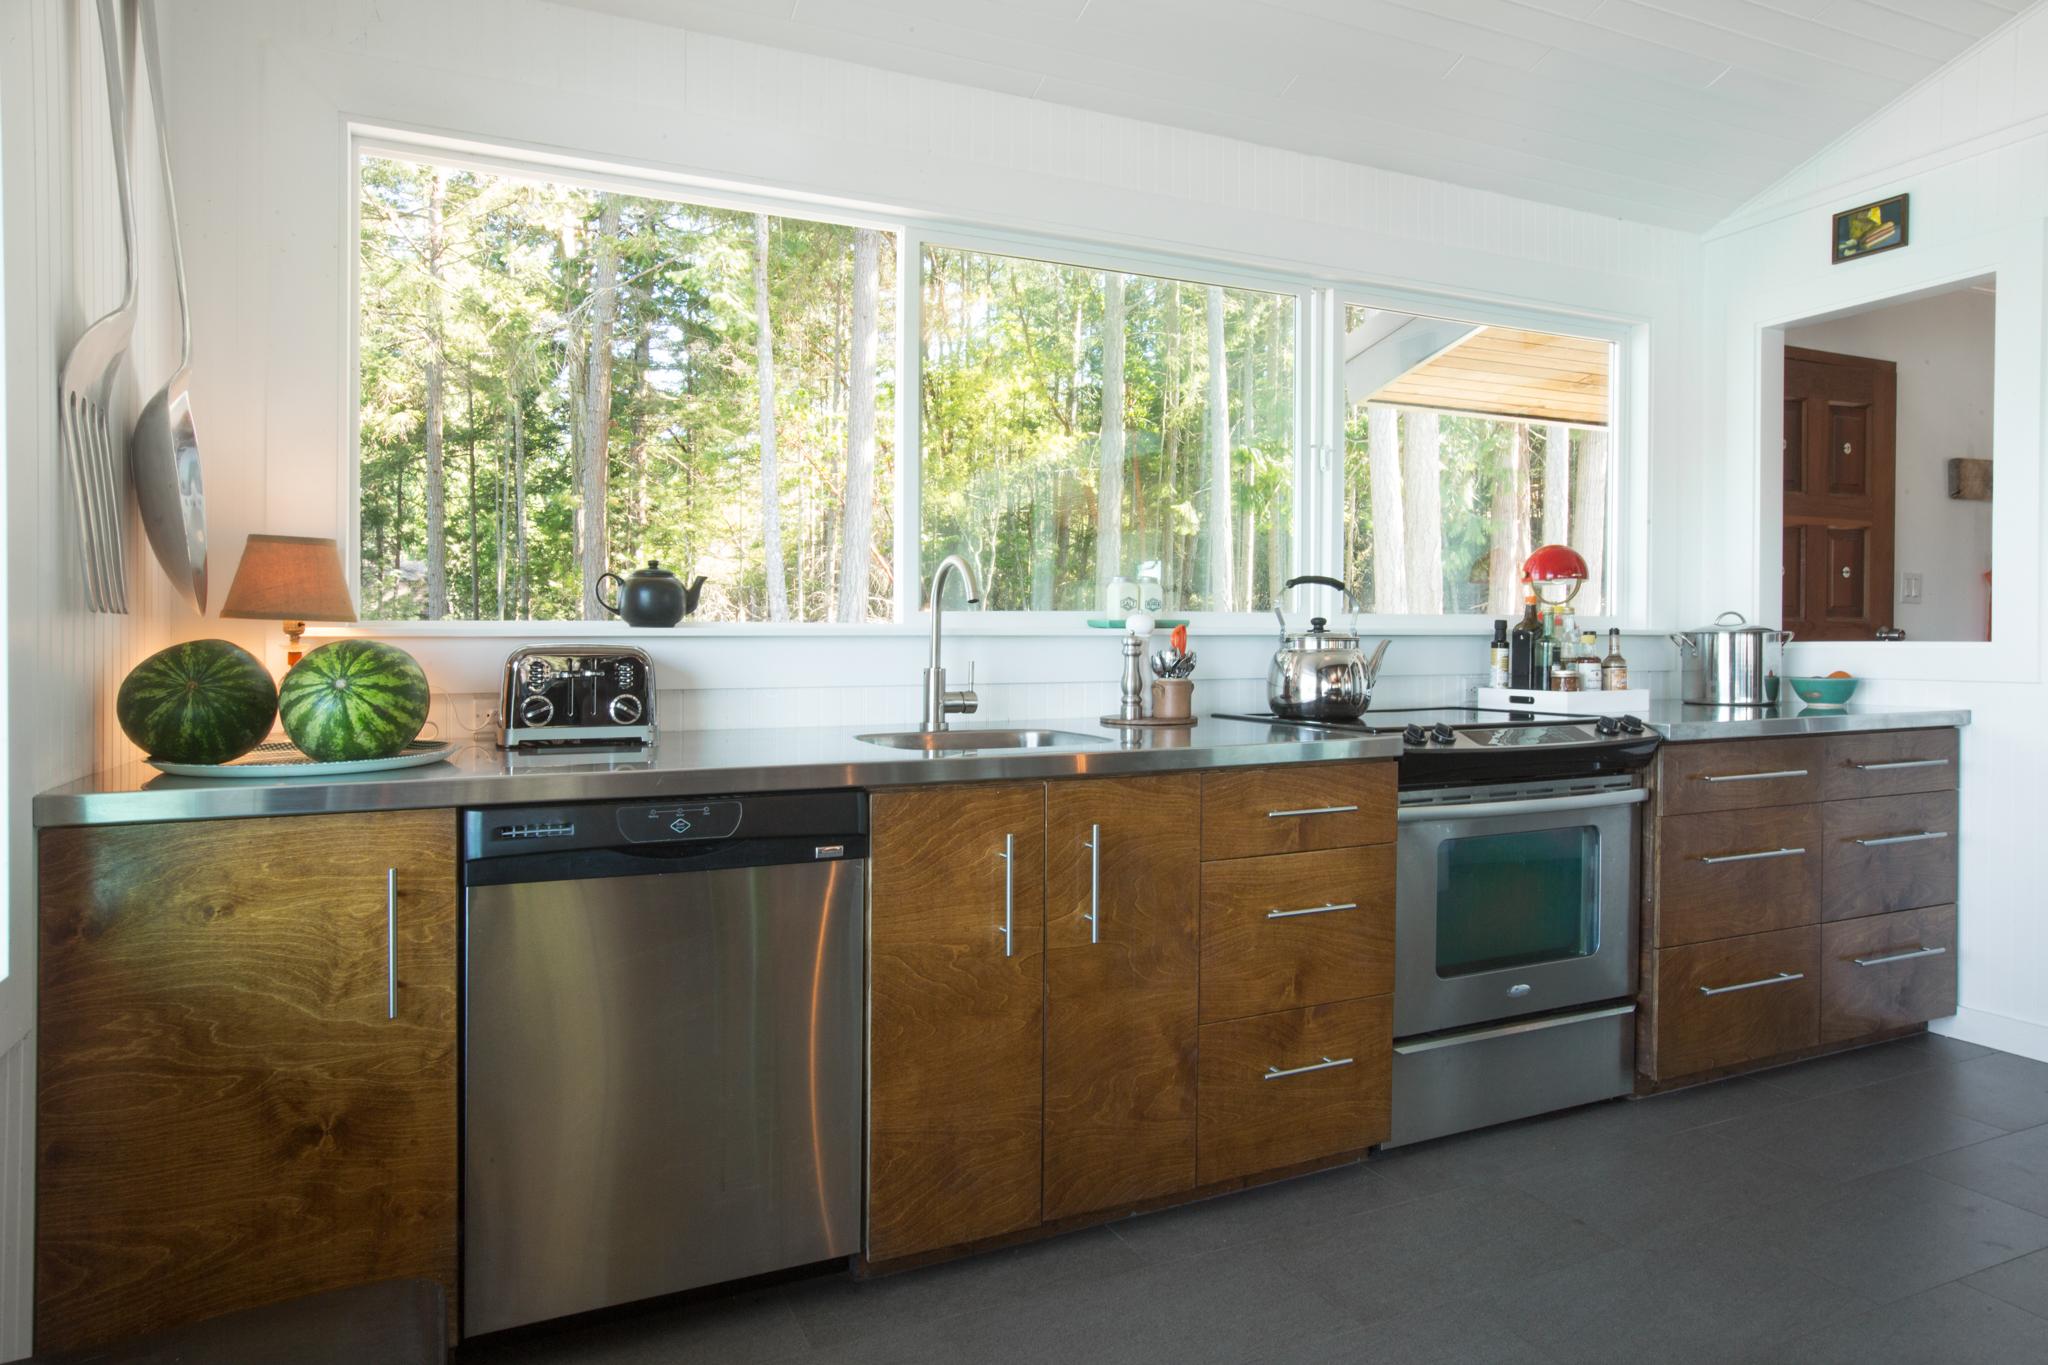 kitchen3-L62.jpg